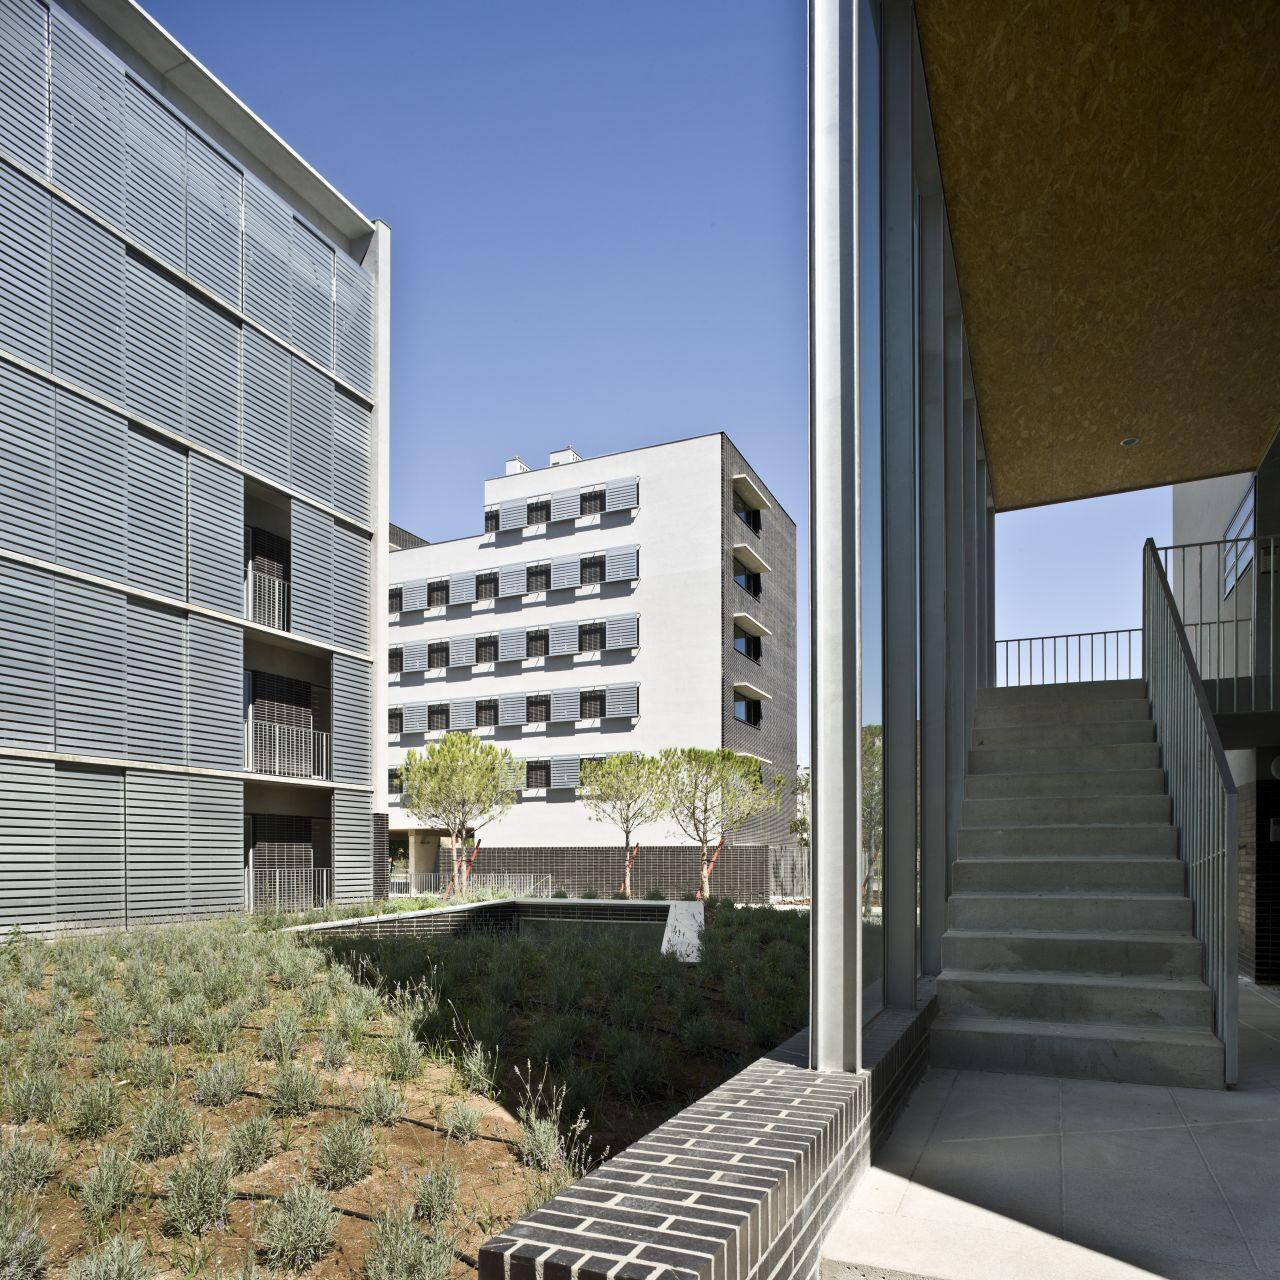 Galeria de conjunto habitacional em albacete burgos garrido arquitectos 12 - Arquitectos albacete ...